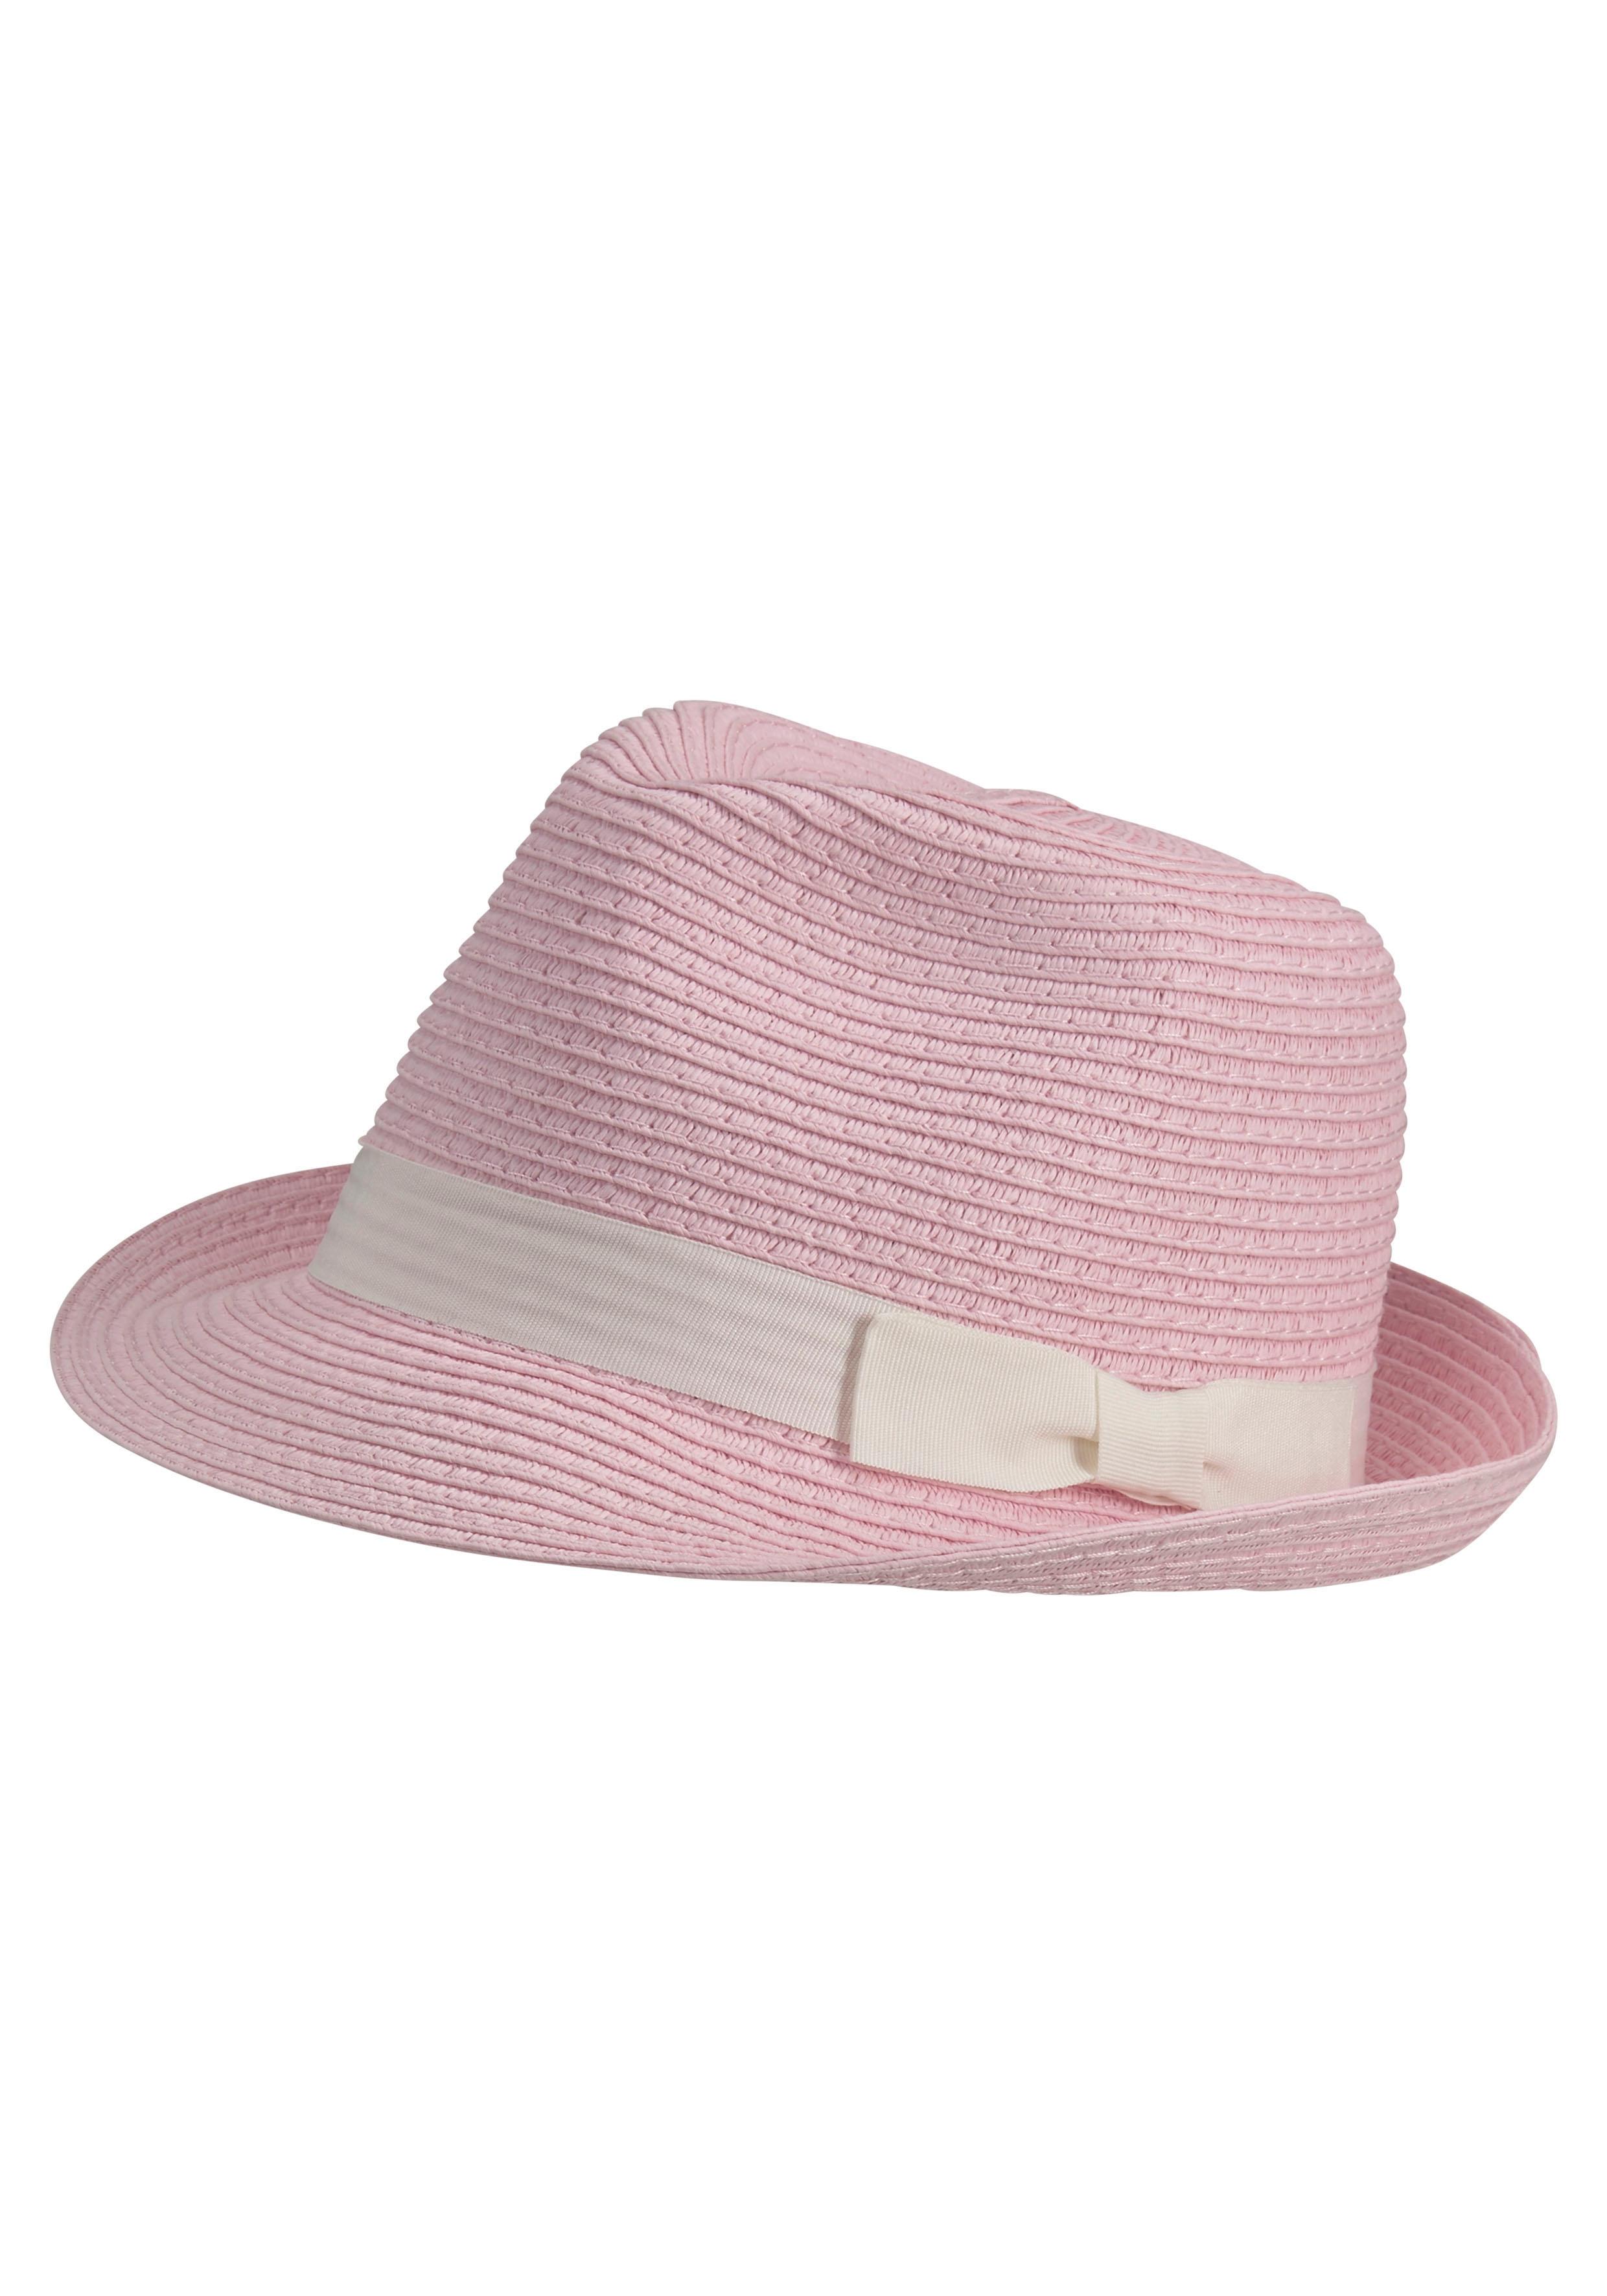 J.Jayz Strohhut rosa Damen Strohhüte Hüte Accessoires